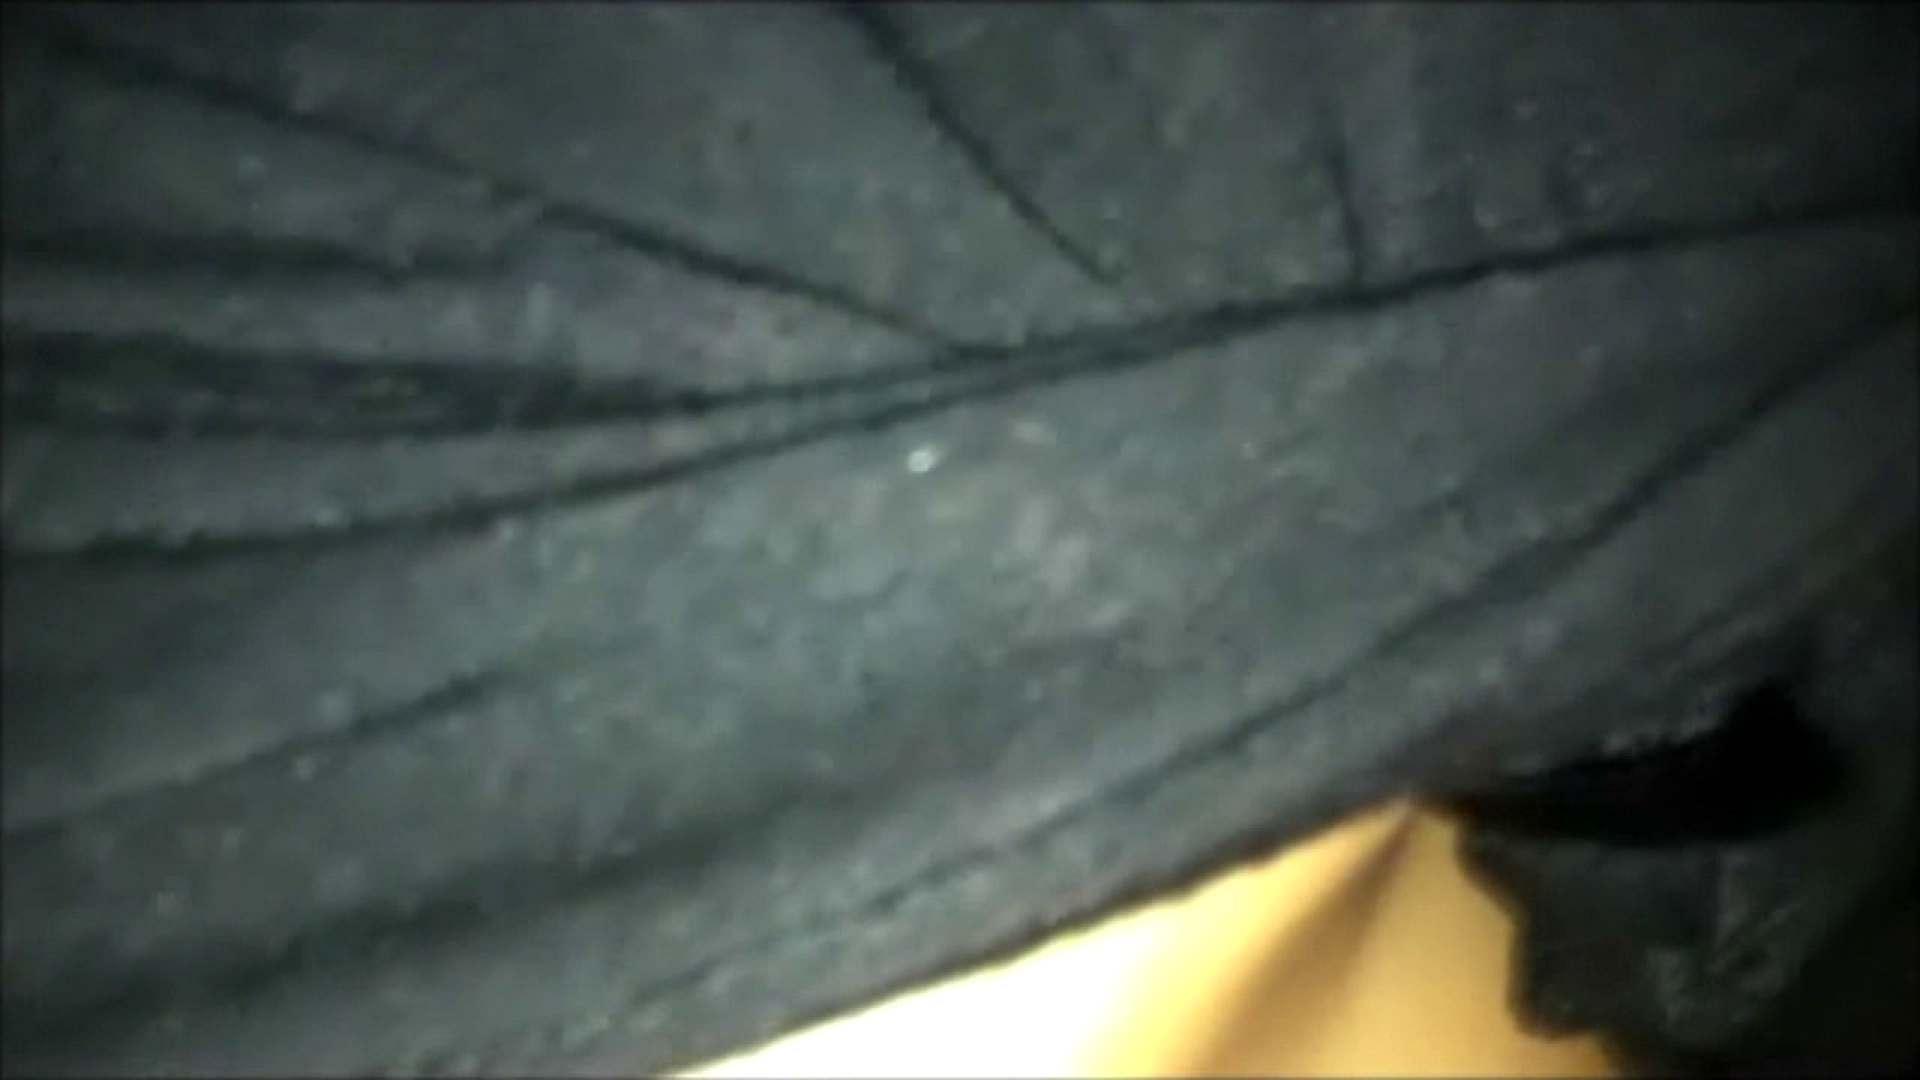 vol.5 【Nちゃん】某百貨店化粧品コーナー店員21歳 恋愛には至らず ギャル達 オマンコ無修正動画無料 108枚 100